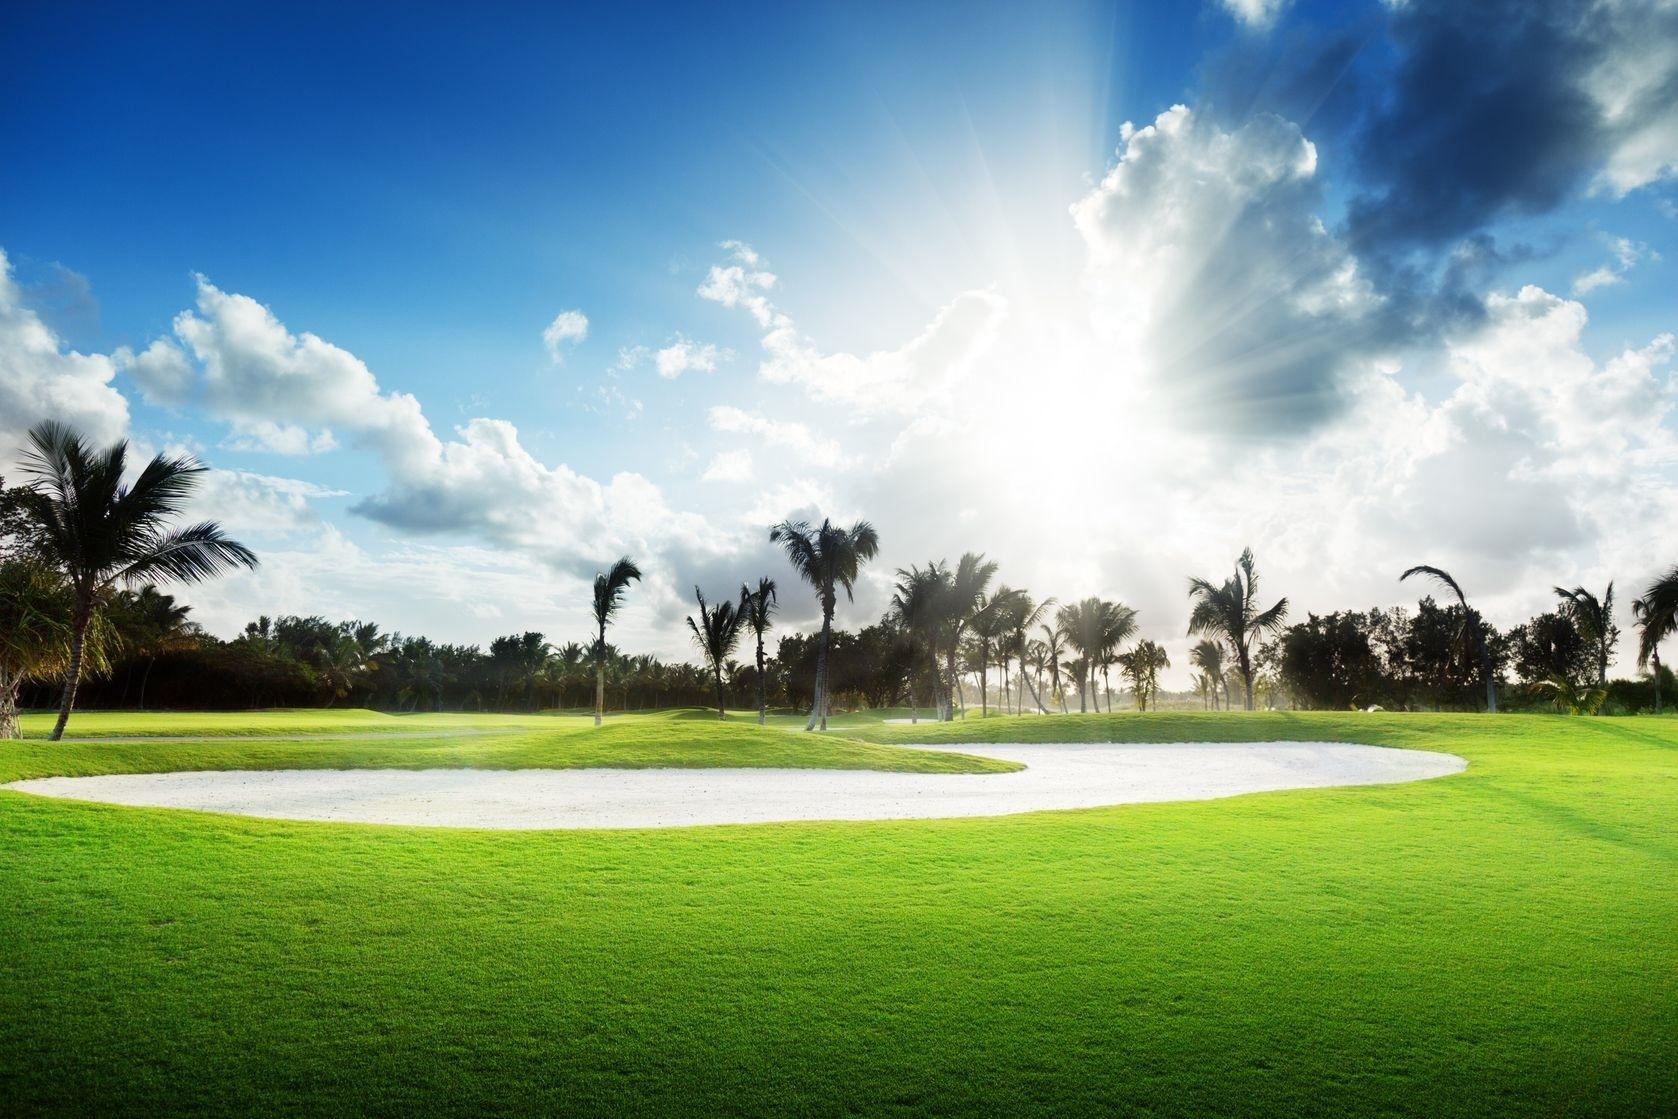 Golfsence